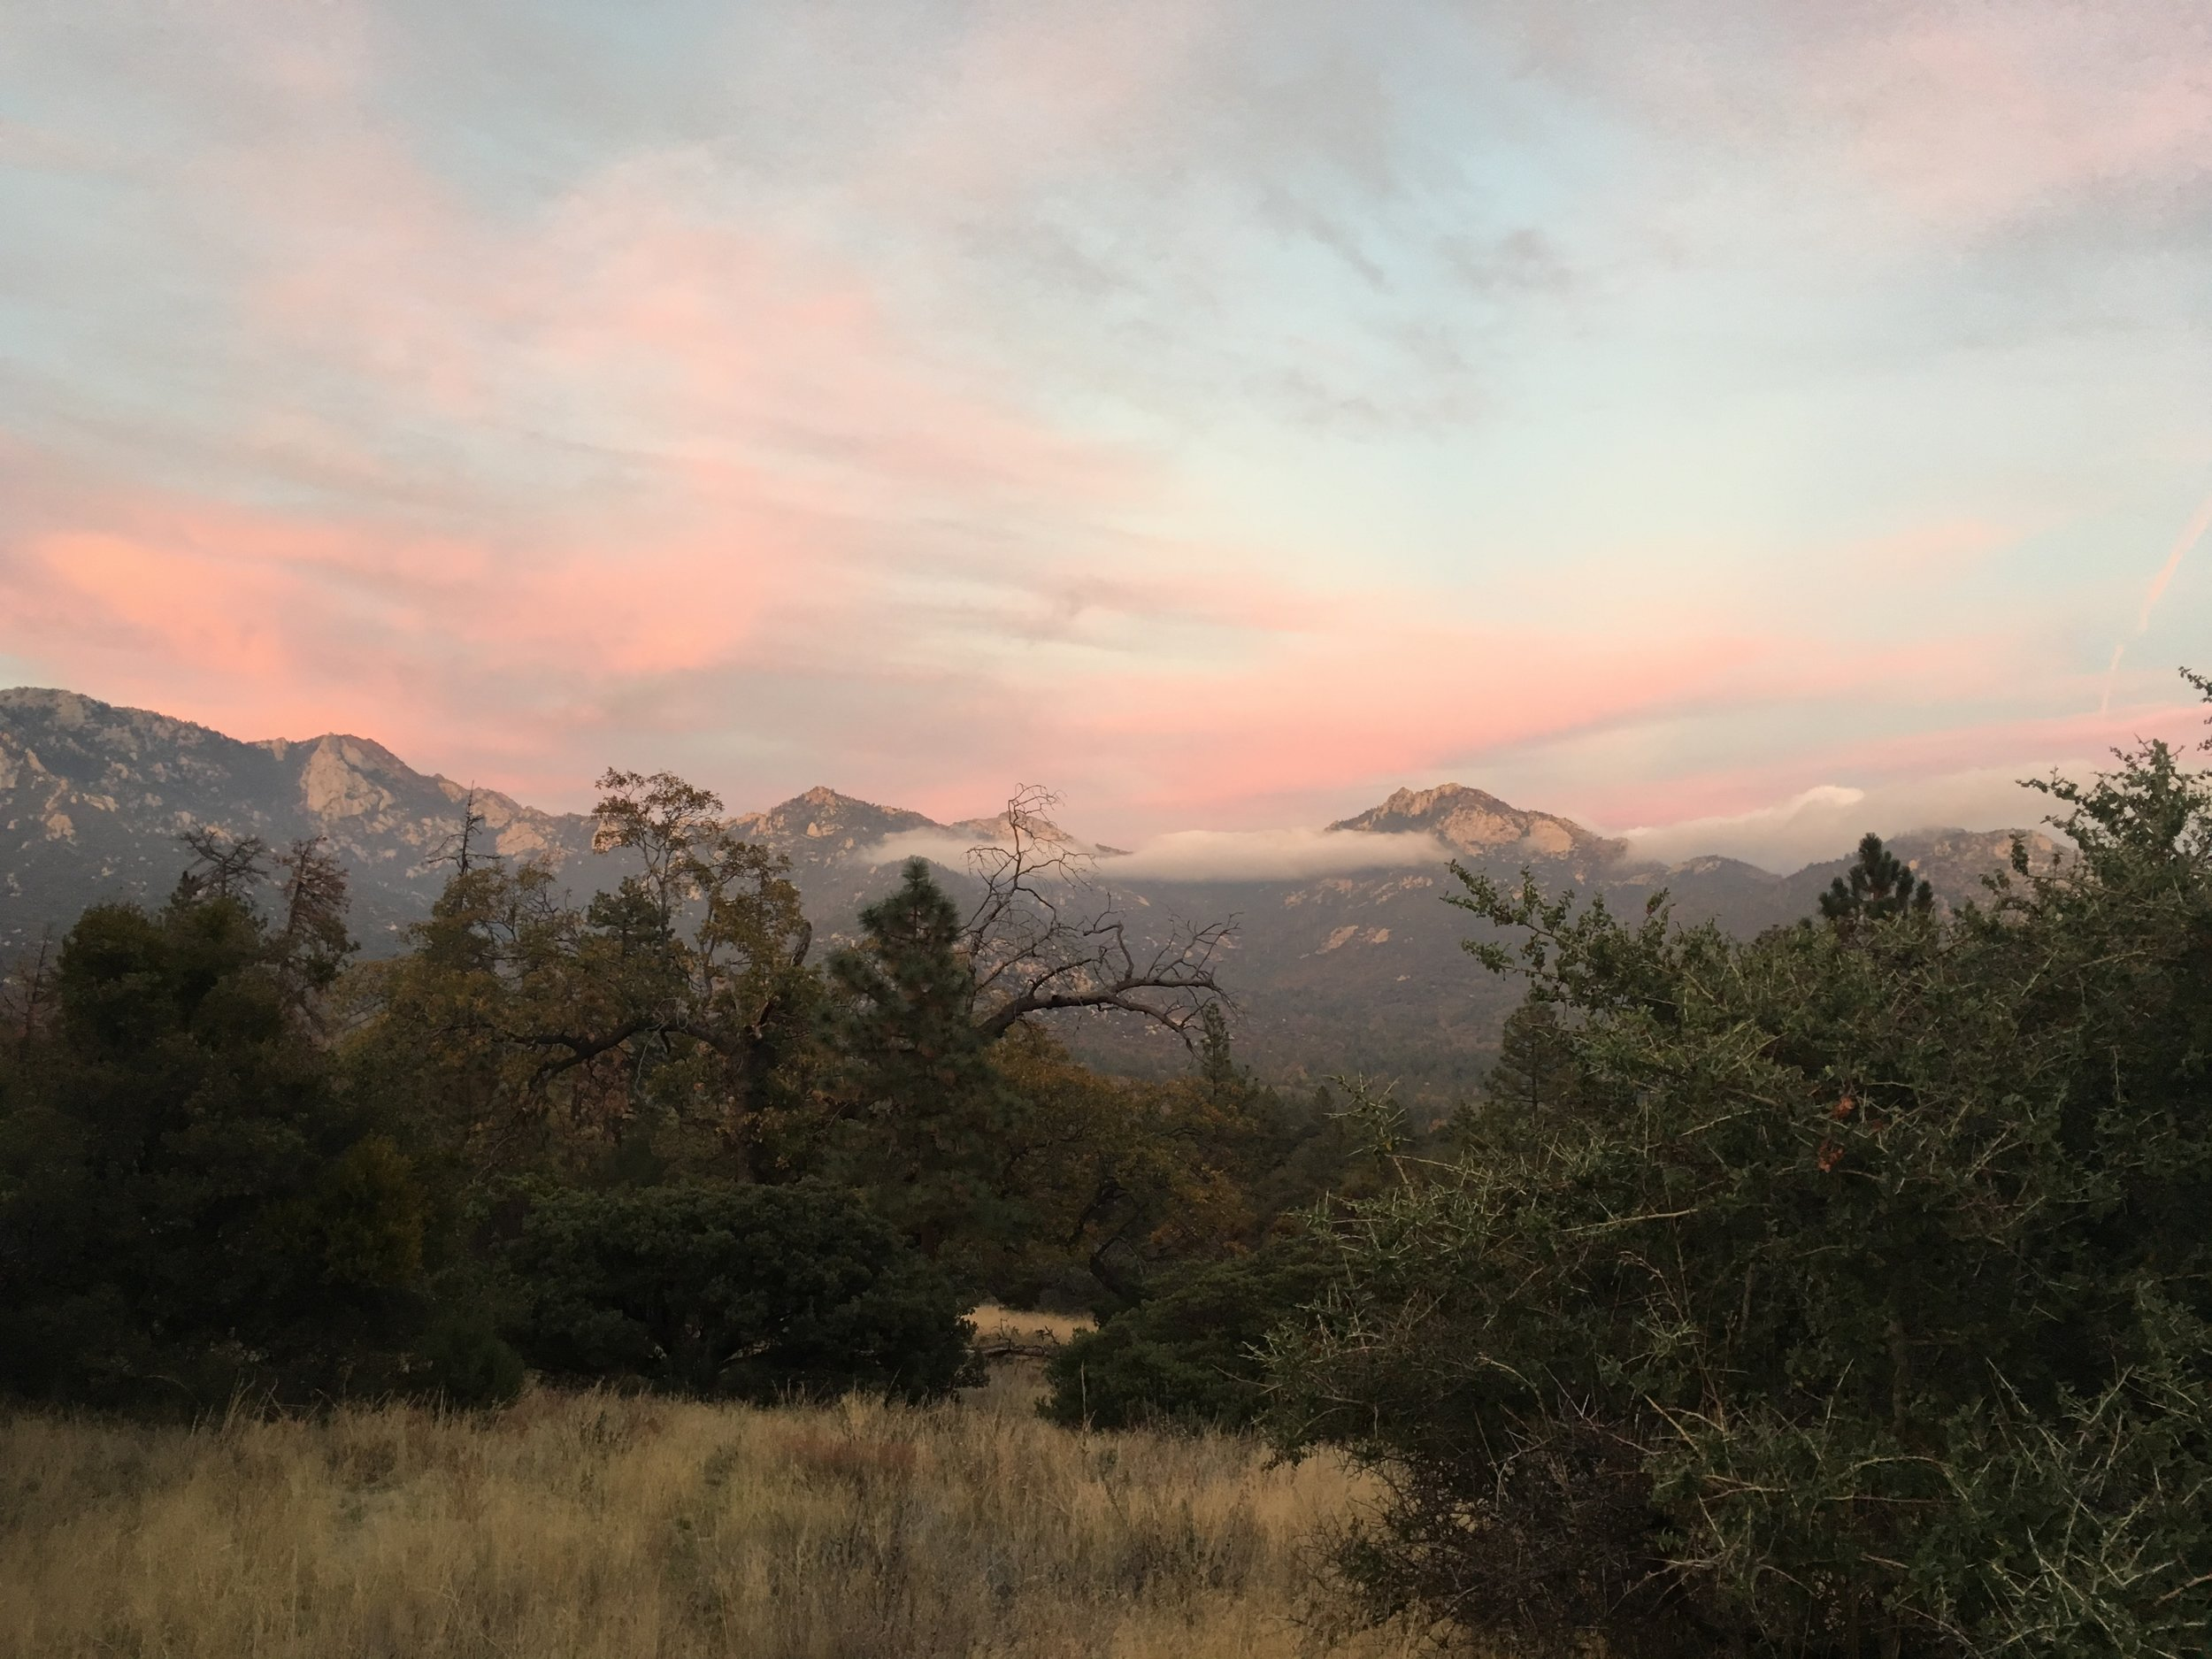 Last light on the San Jacintos as we made our way to Herkey Creek Campground.